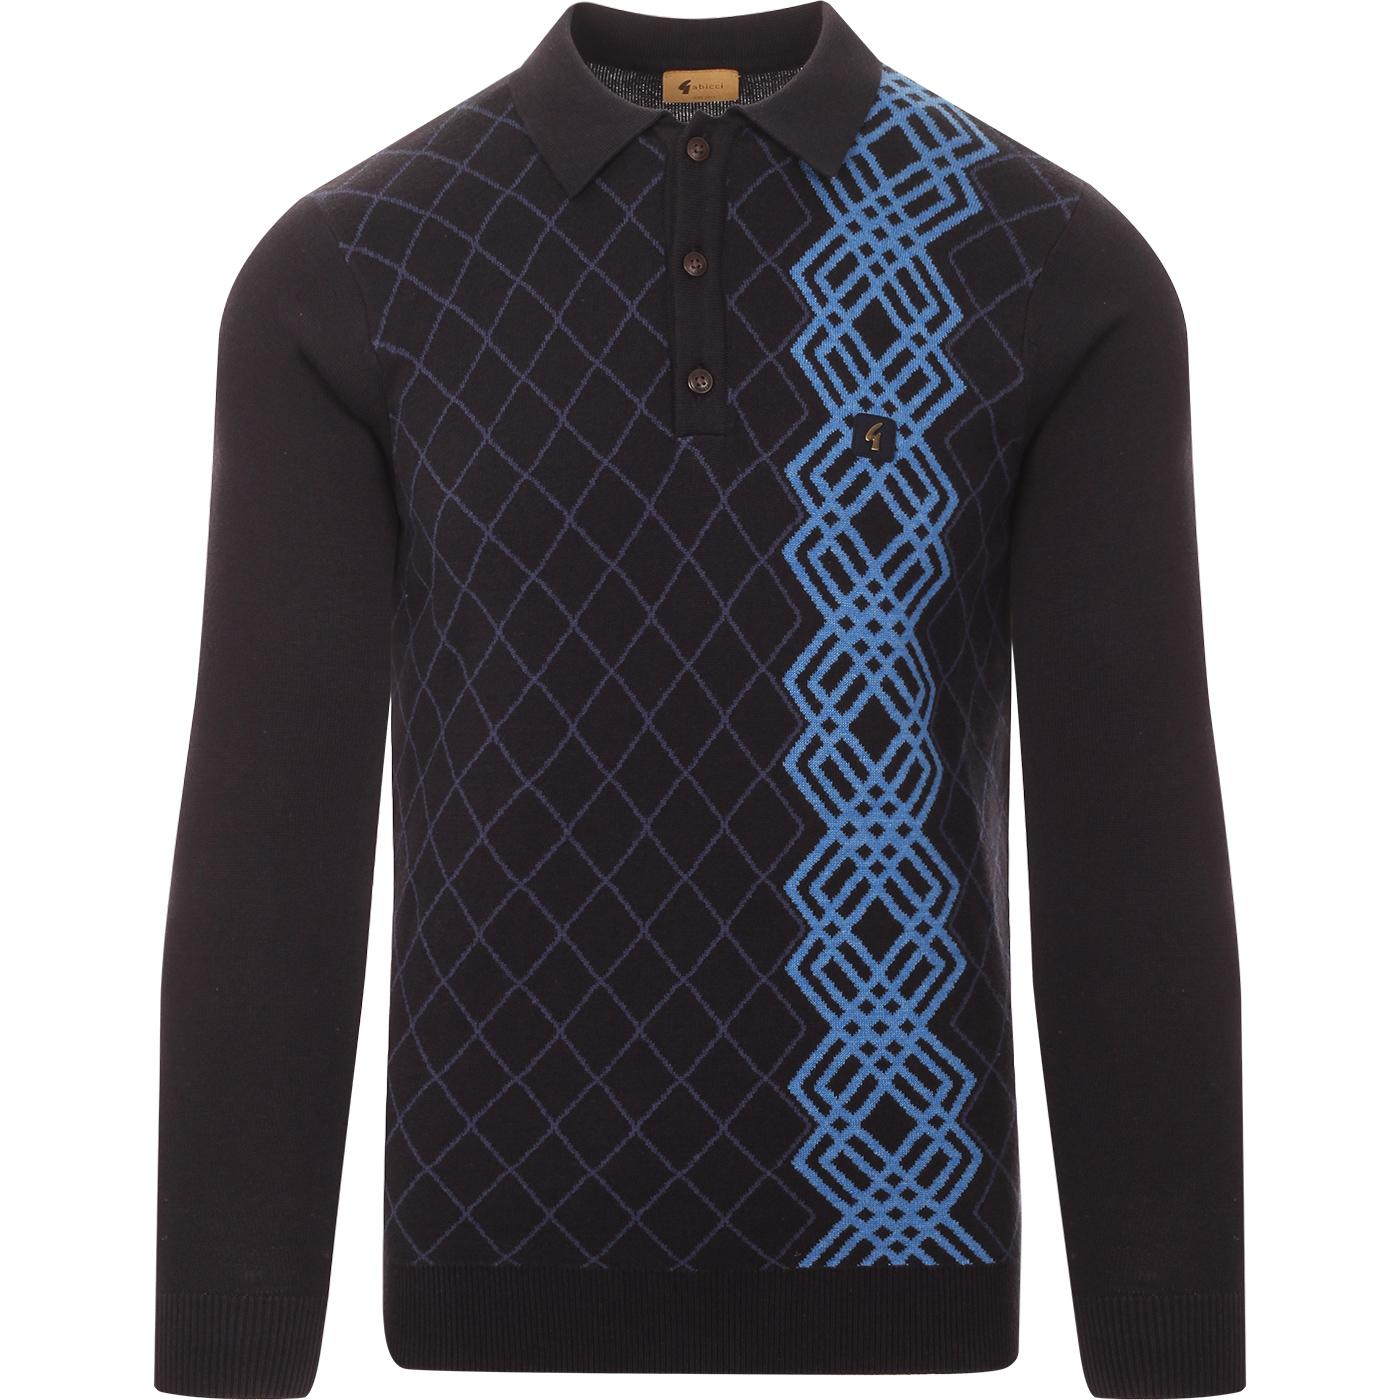 Bogarde GABICCI VINTAGE Mod Argyle Knit Polo (N)